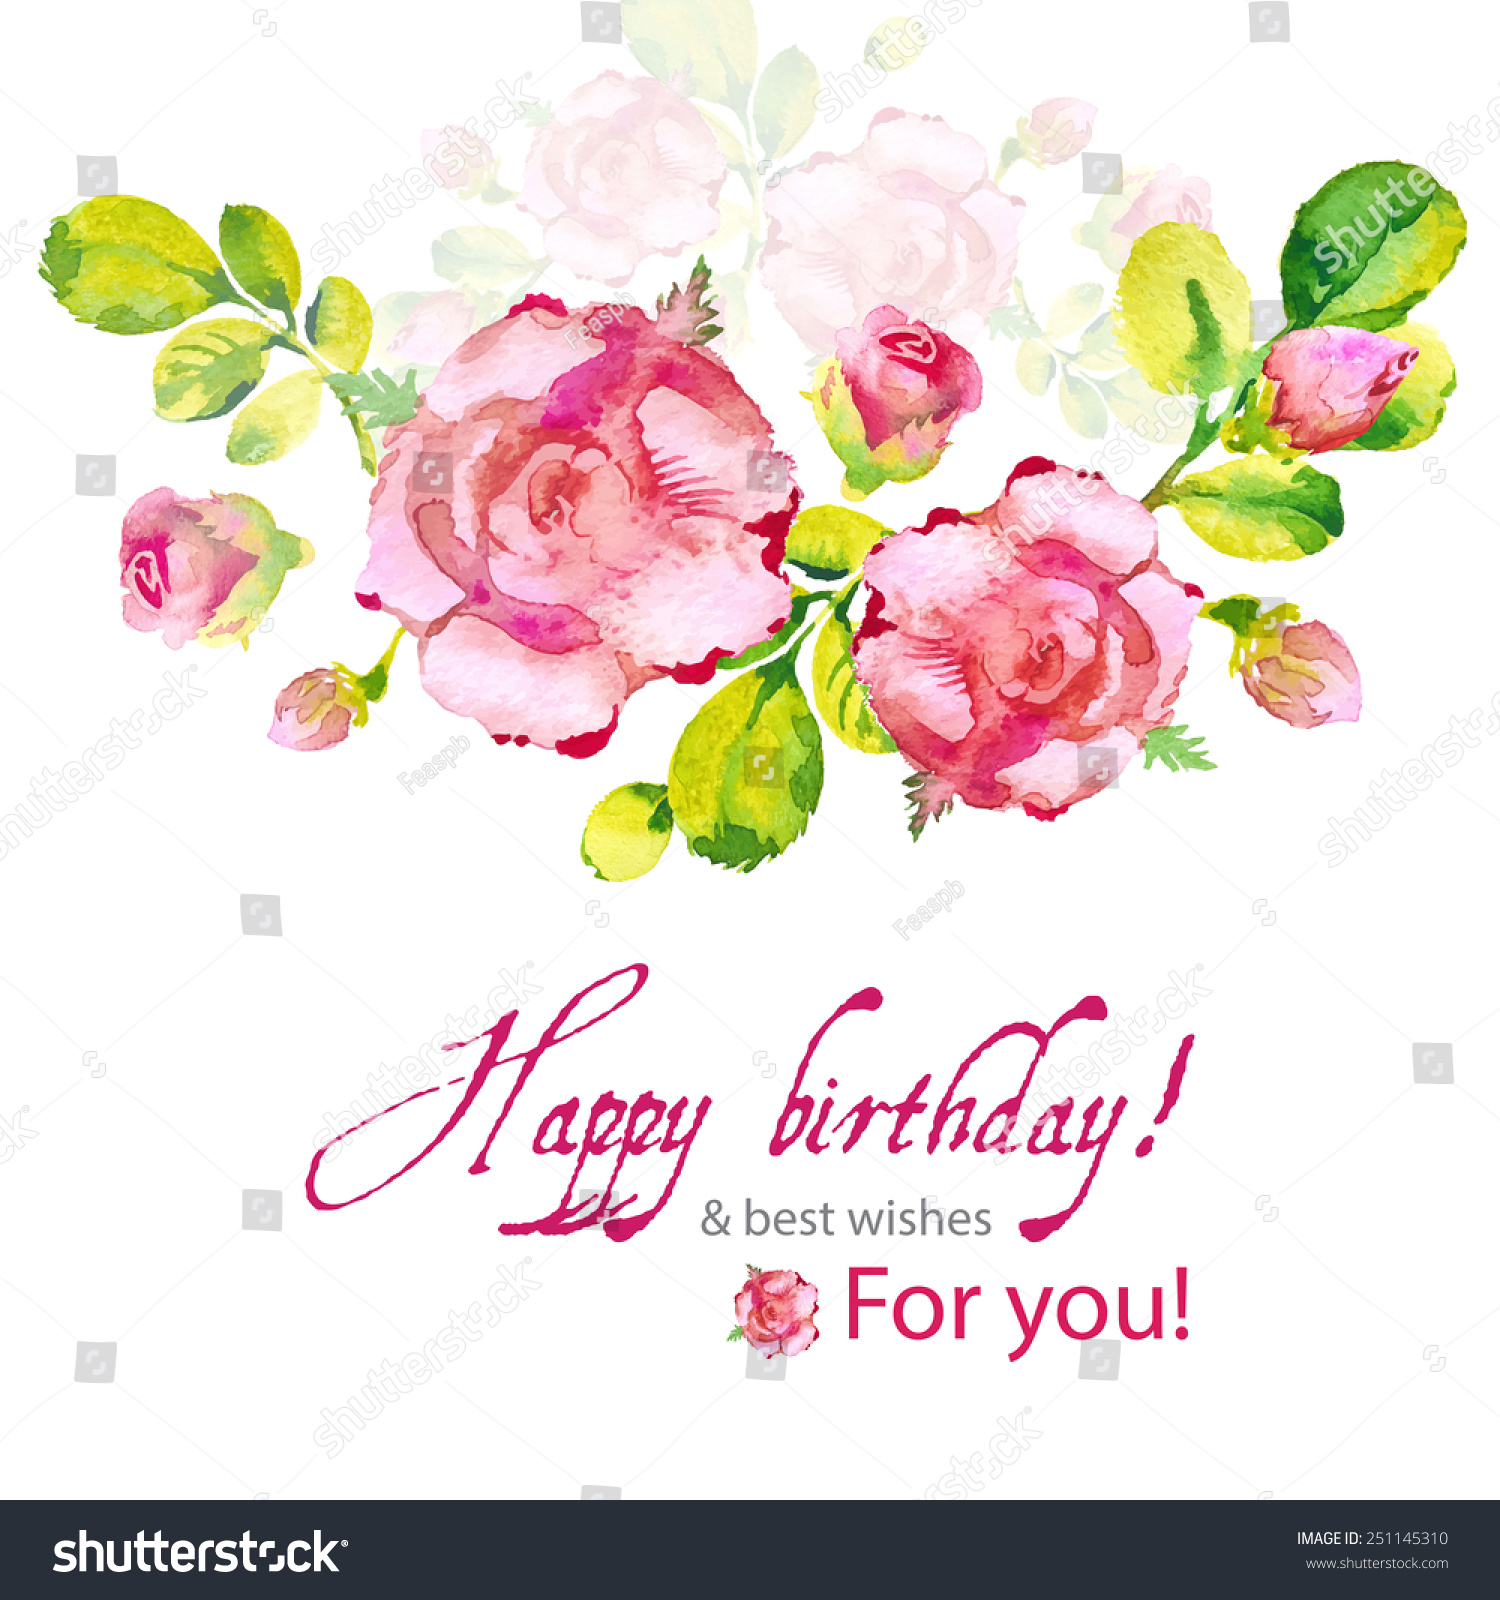 Birthday flower cards happy birthday flowers blossom greeting card happy birthday vintage flower card vector izmirmasajfo Gallery